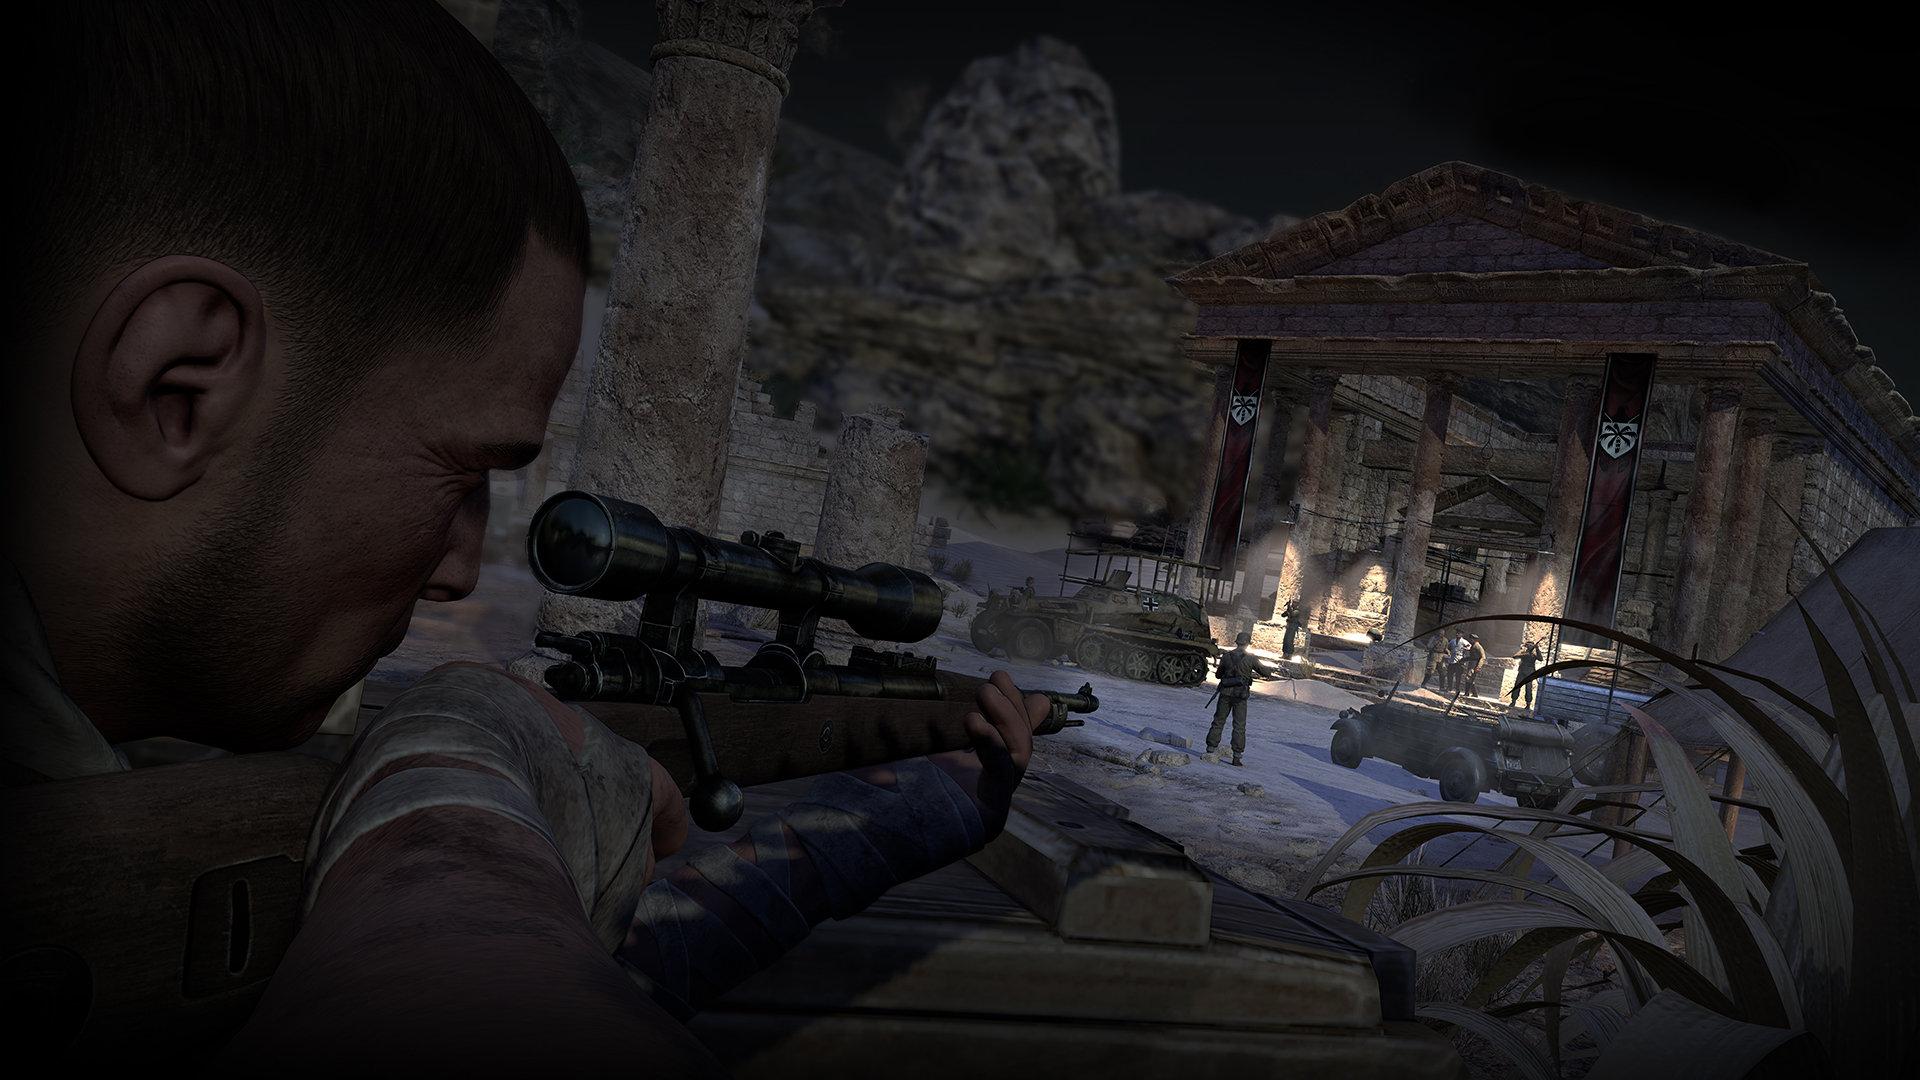 sniper-elite-3-screenshot-04-ps4-us-12ju